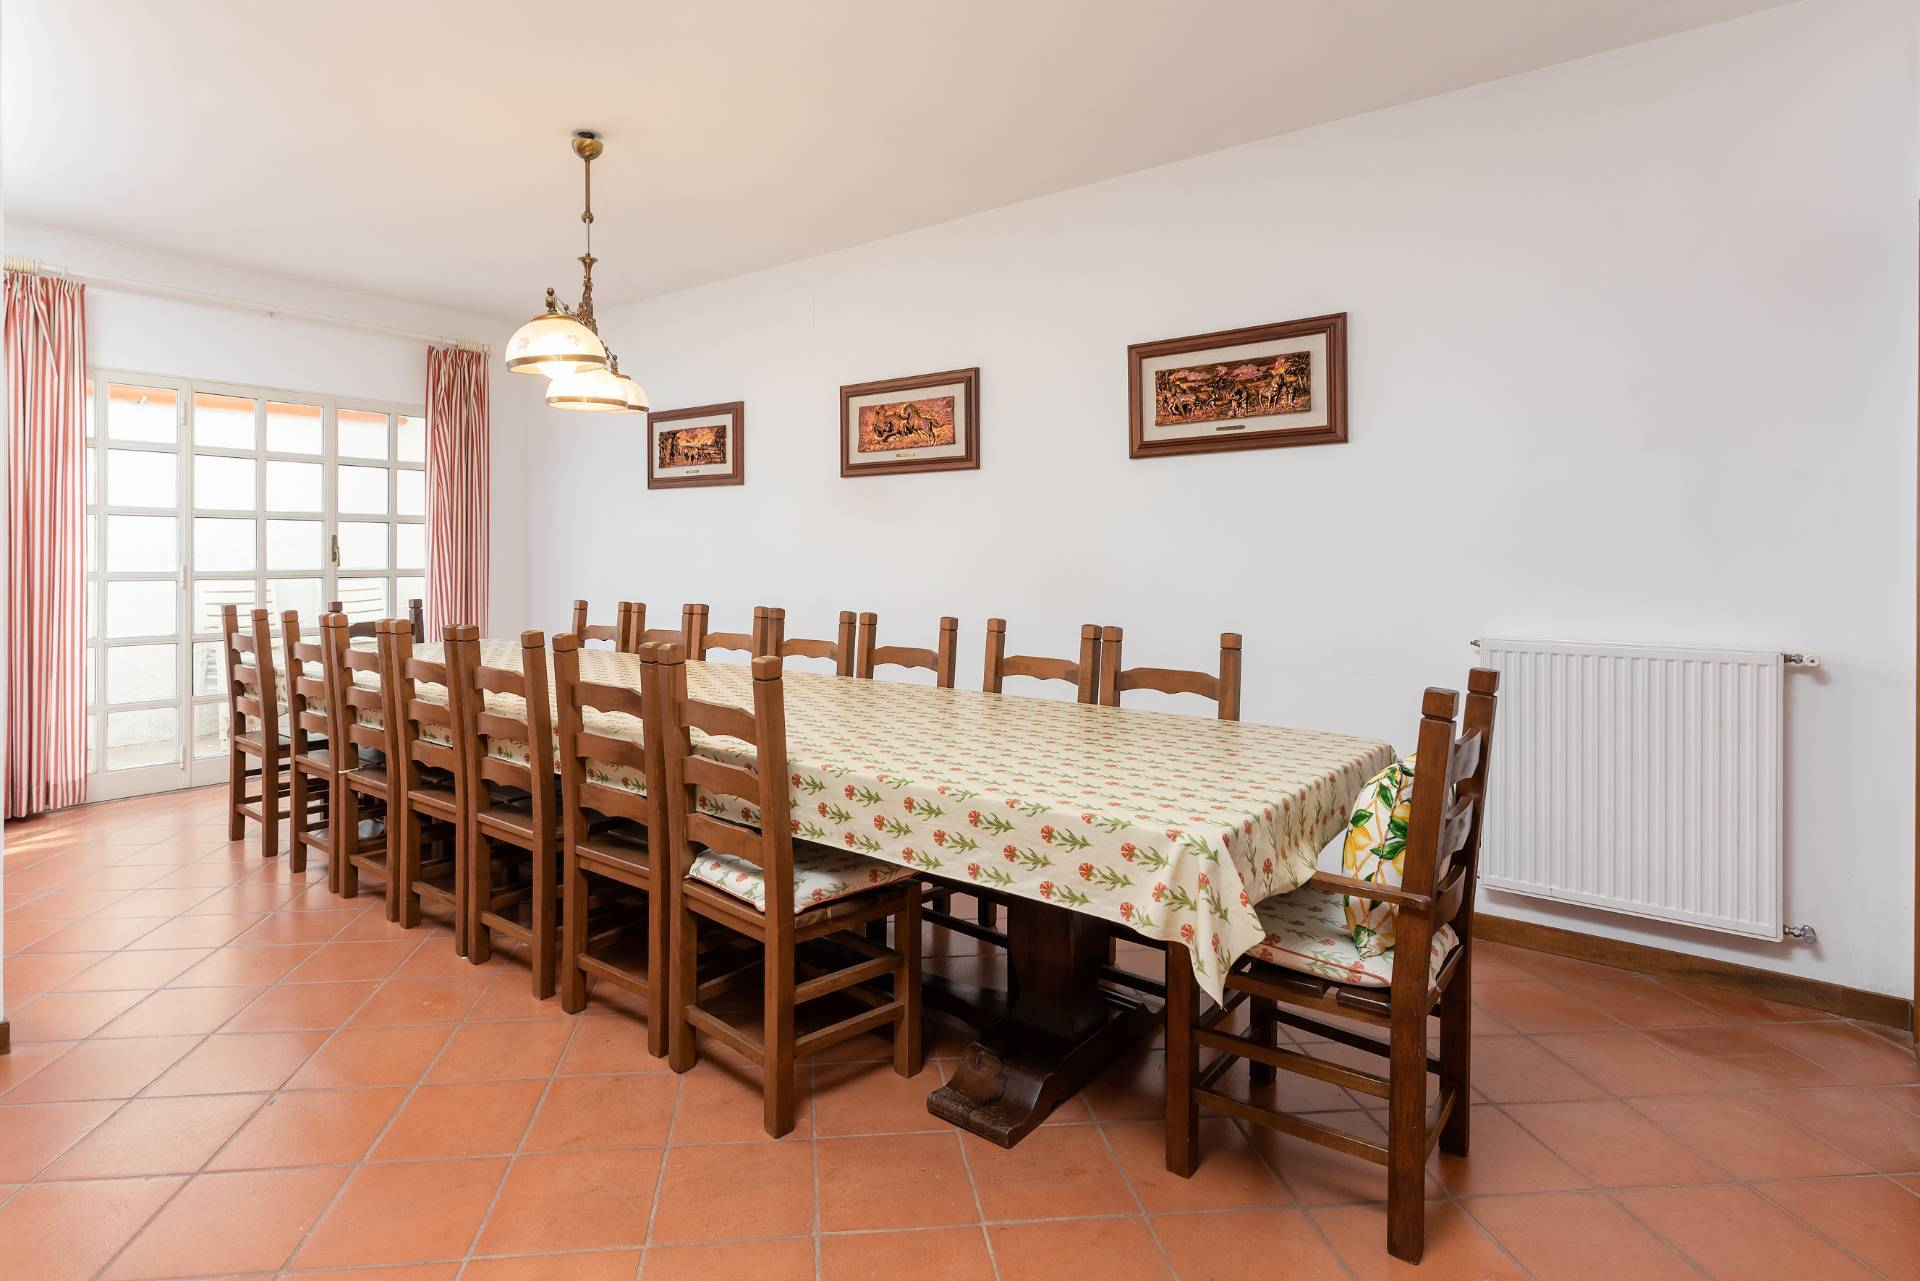 Villa in Vendita a Ariccia: 5 locali, 583 mq - Foto 25